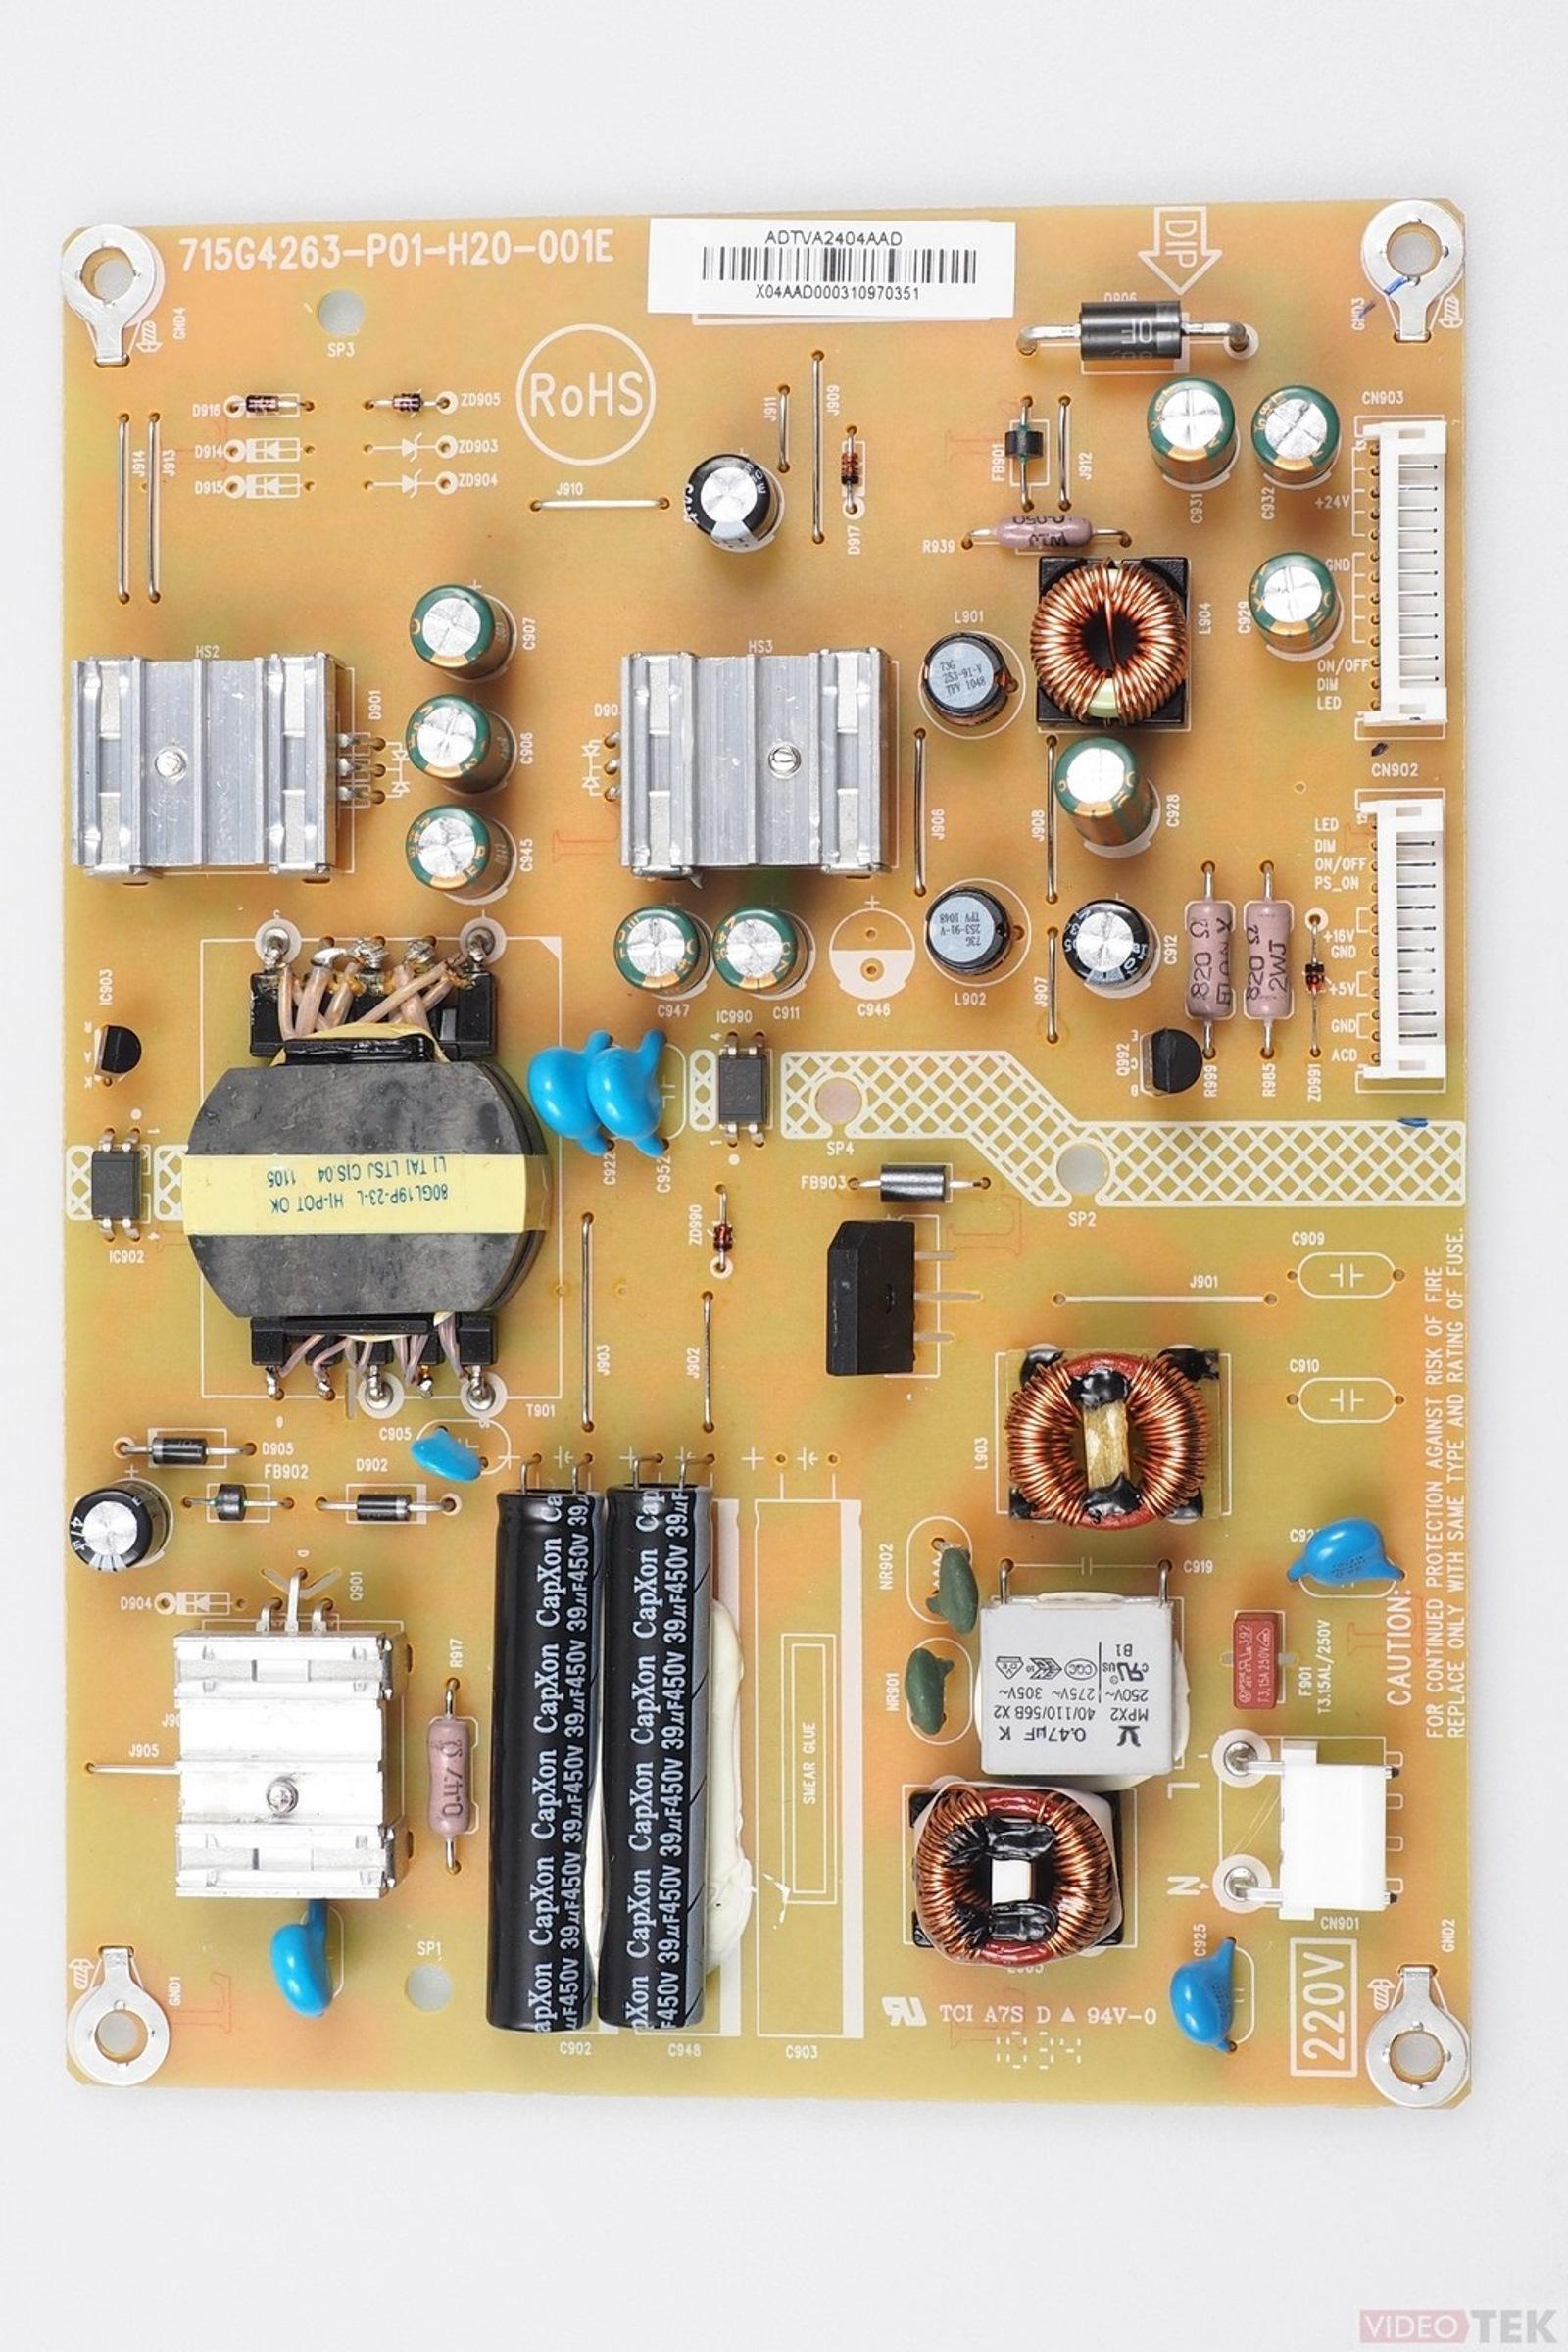 PL ALIM LCD TOSHIBA 715G4263-P01-H20-001E 75022447